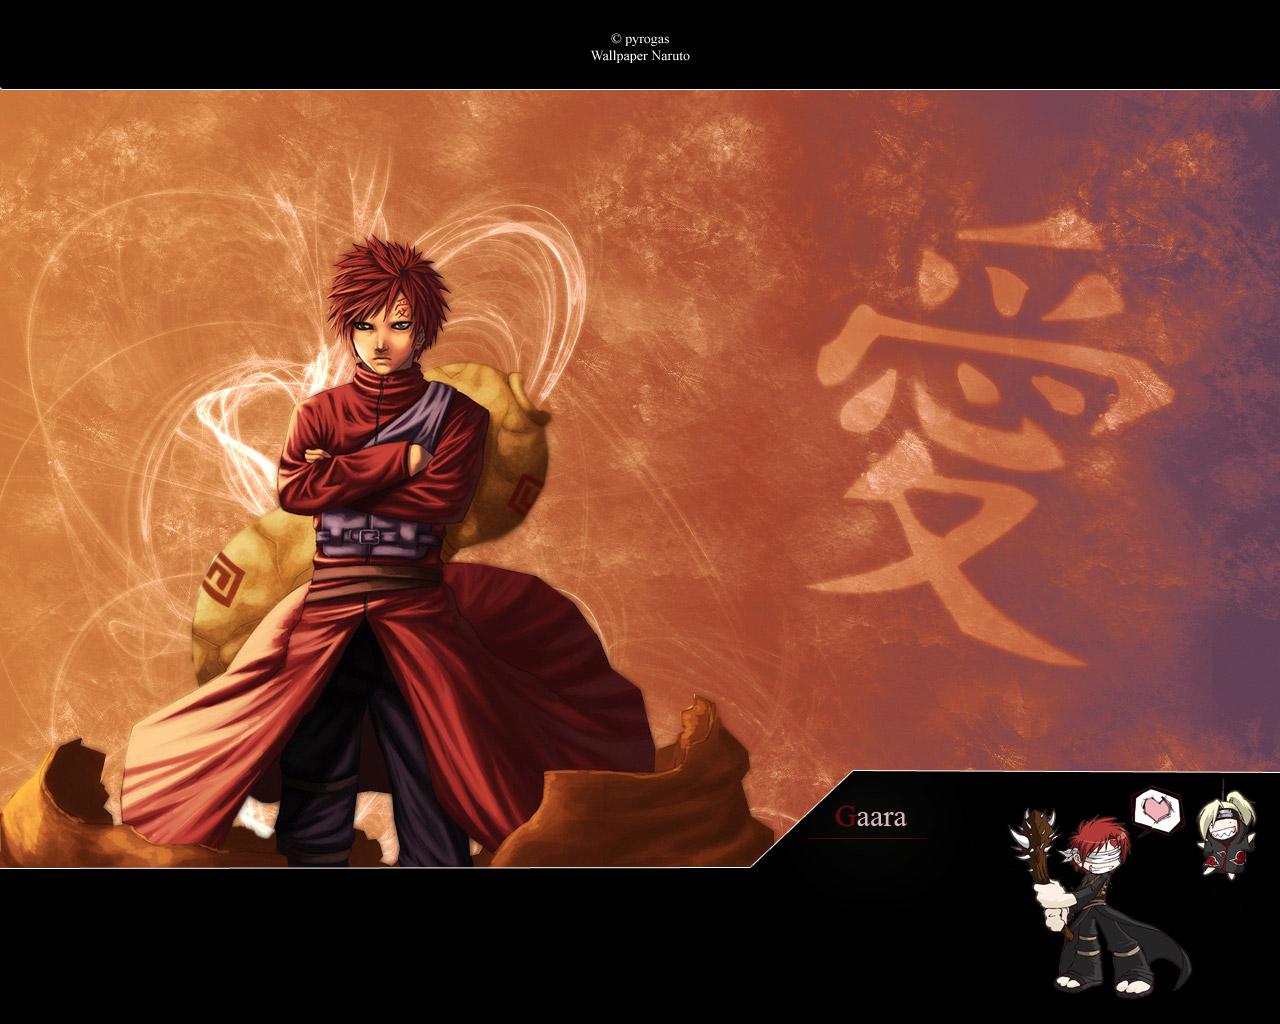 Gaara Naruto Wallpaper 1280x1024